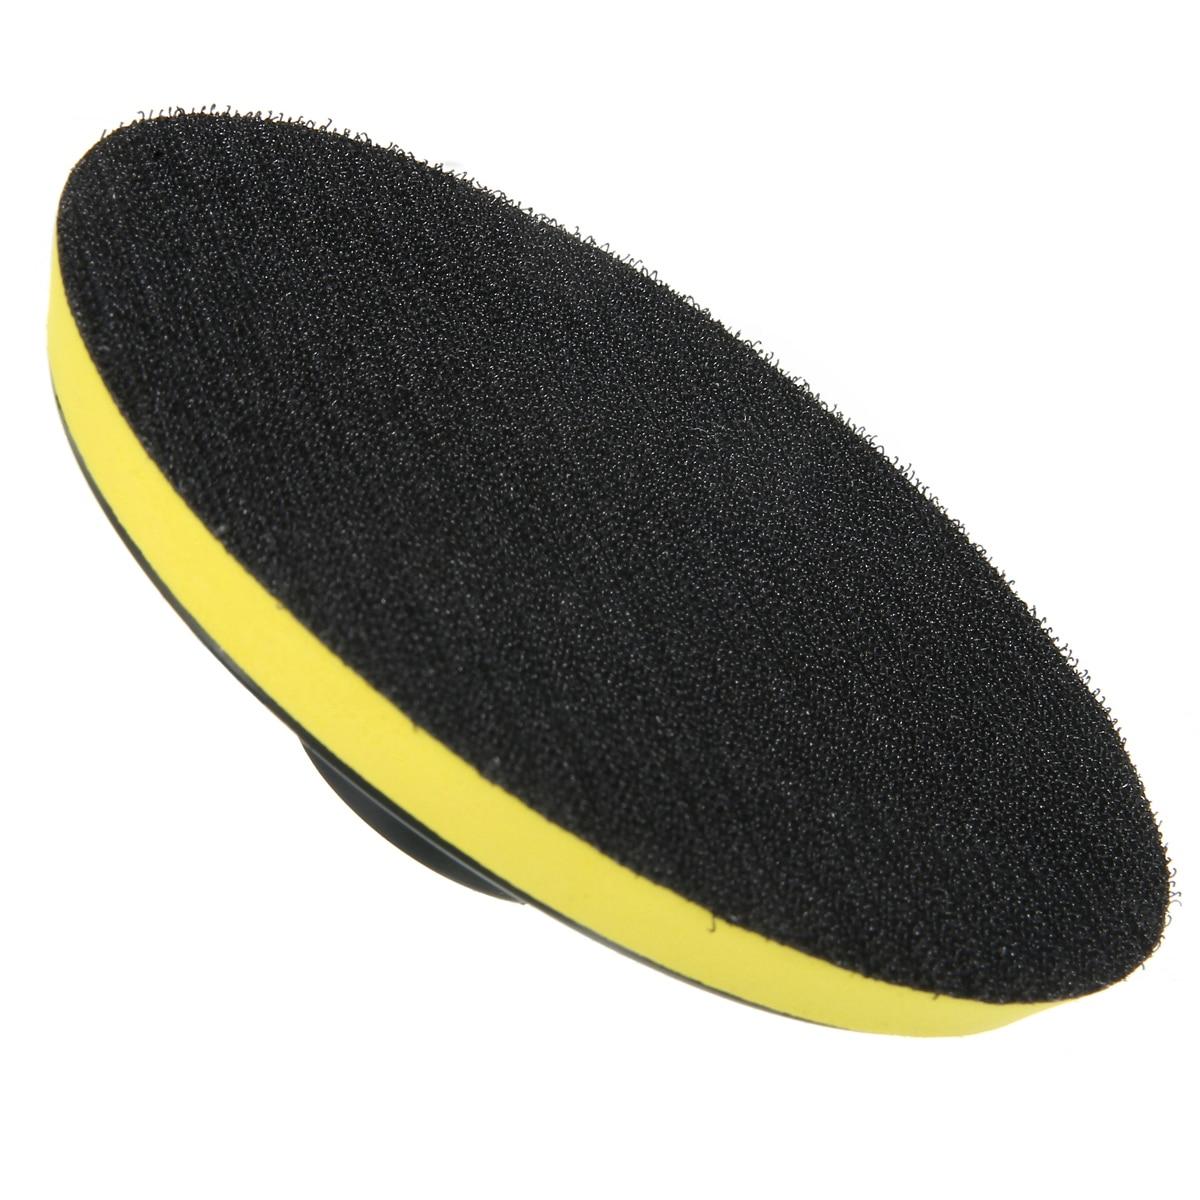 New M14 Backing Pad Wheel 75-100-125mm Polishing Buffing Plate Disc Adhesive Backed Hooks For DIY Car Polishing Adhesive Backer